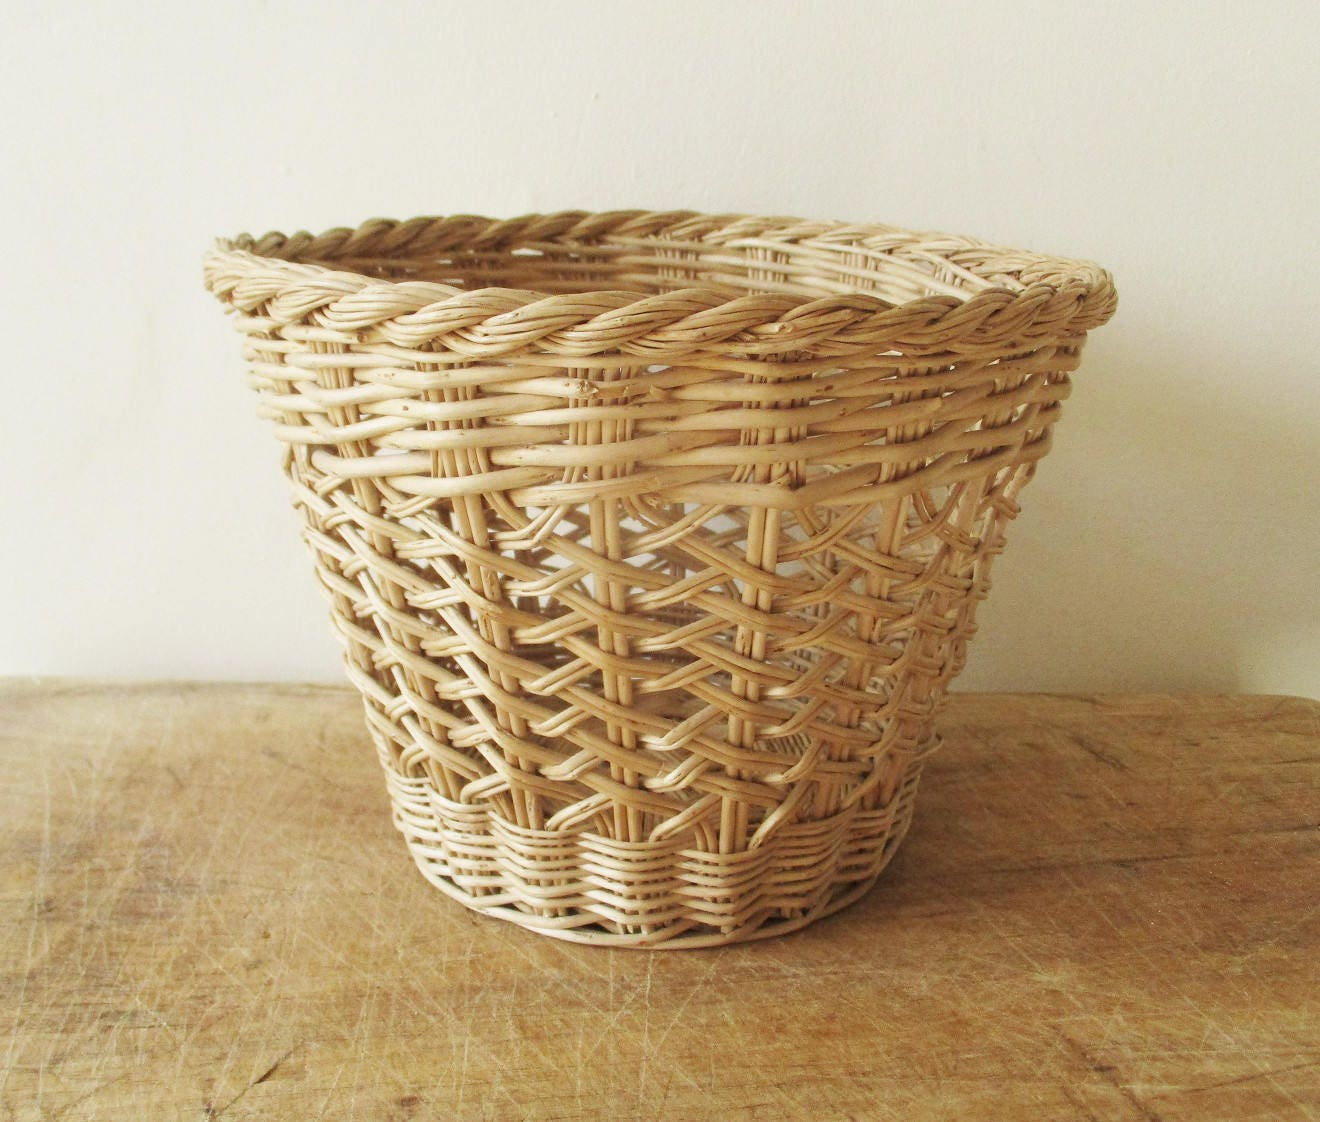 Peindre Un Panier En Osier vintage little french wicker basket, 1960s, corbeille panier osier, france,  vintage home decor